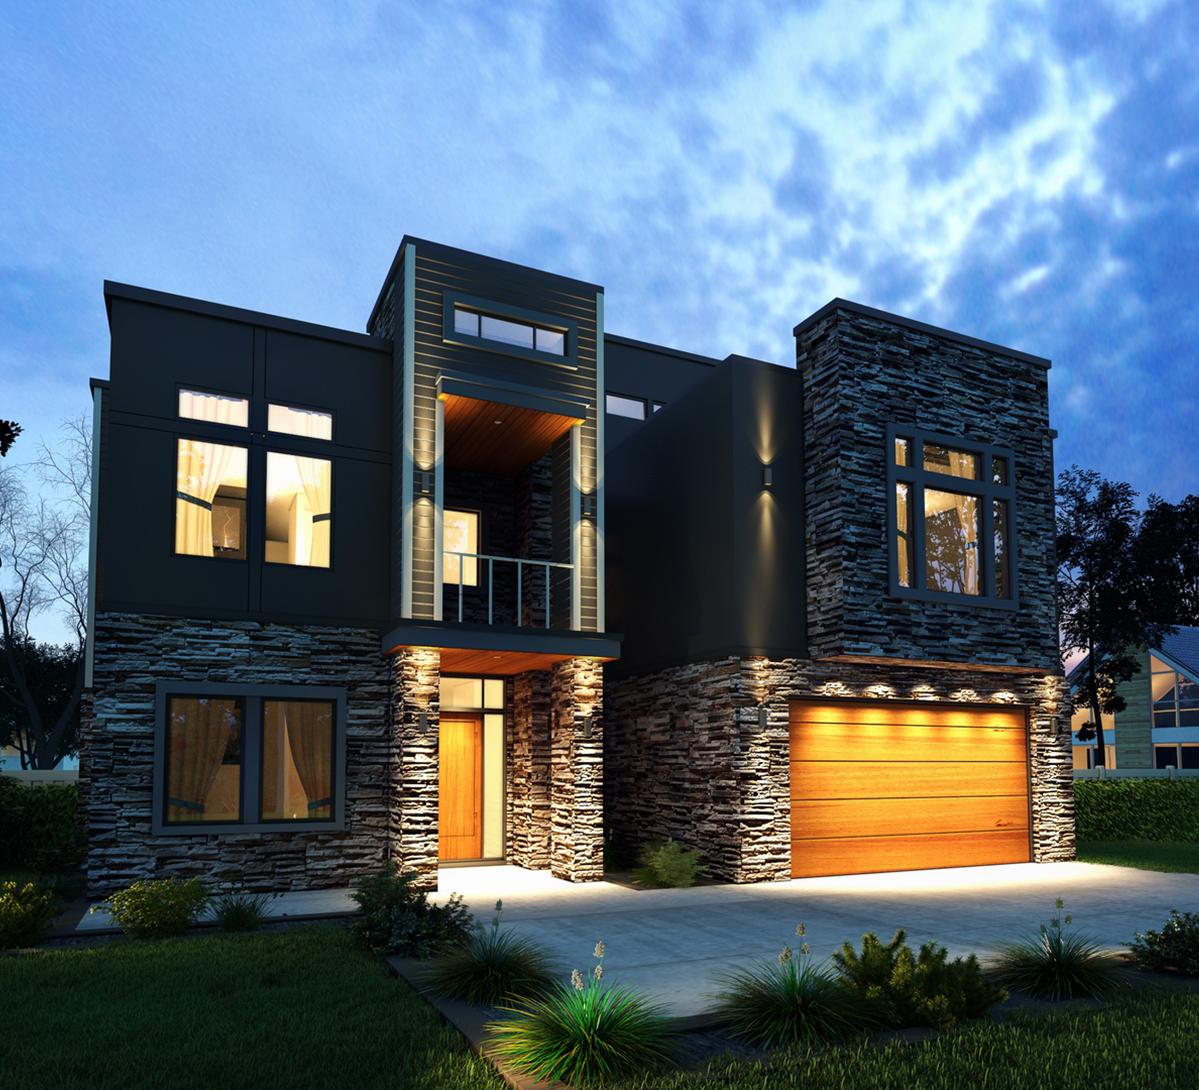 Design,House,Modern,Custom, Architecture,Construction,Engineering, Houston, Texas, Humble, Kingwood, Atascosita, Porter, Huffman, USA